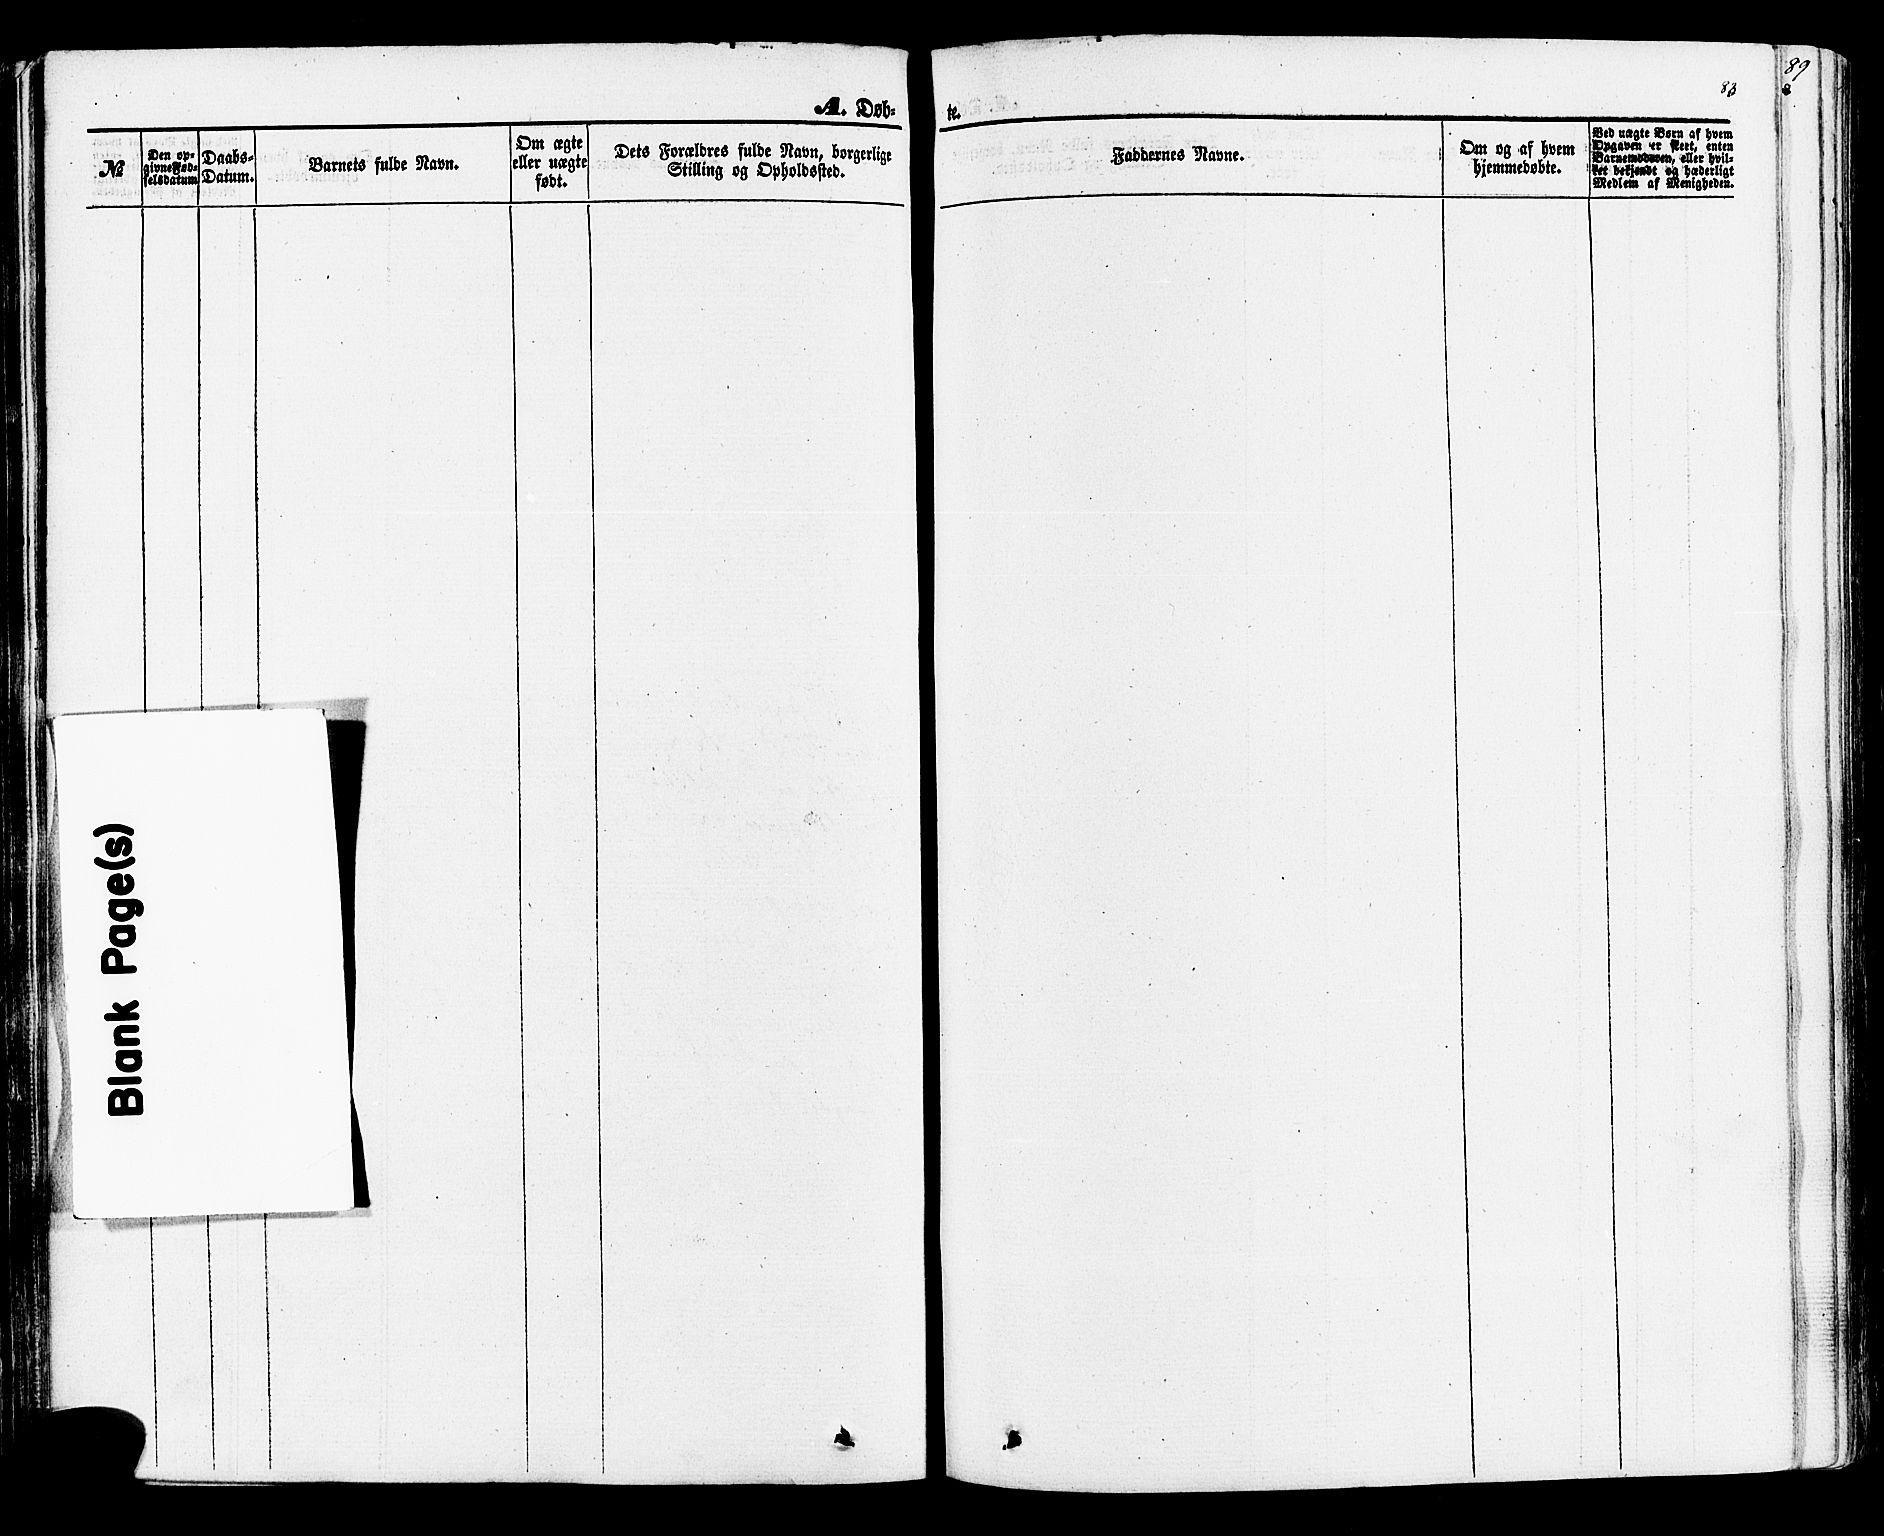 SAKO, Rauland kirkebøker, F/Fa/L0003: Ministerialbok nr. 3, 1859-1886, s. 83